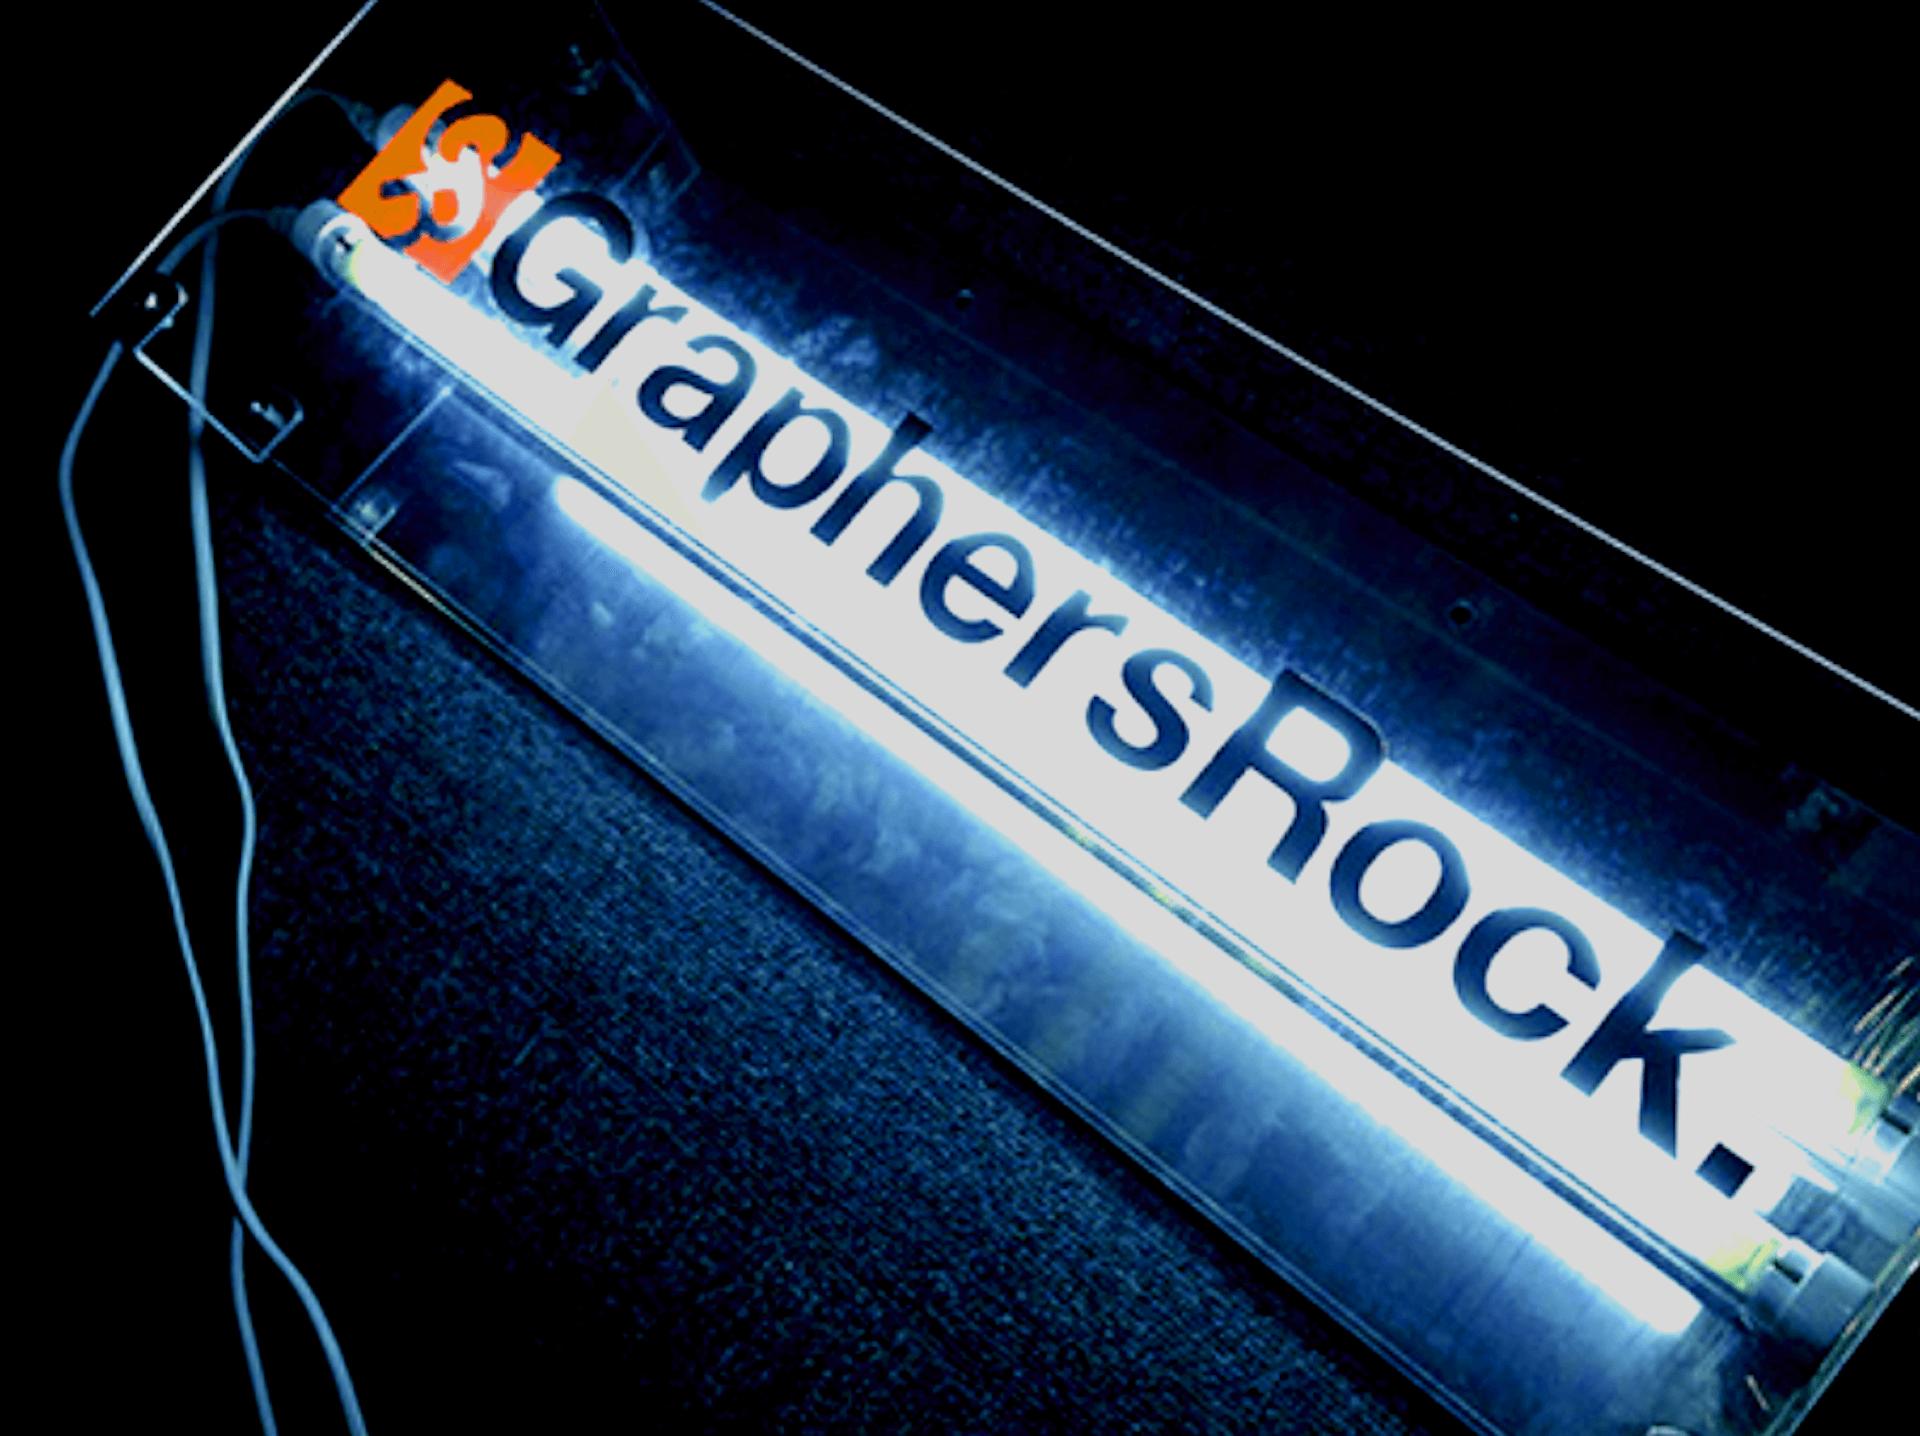 HARLEY-DAVIDSON®が新プロジェクト「RE_SEEK for FREEDOM」を始動!GraphersRockとのコラボデザイン・バイクが限定販売決定 music200212_graphersrock_3-1920x1436